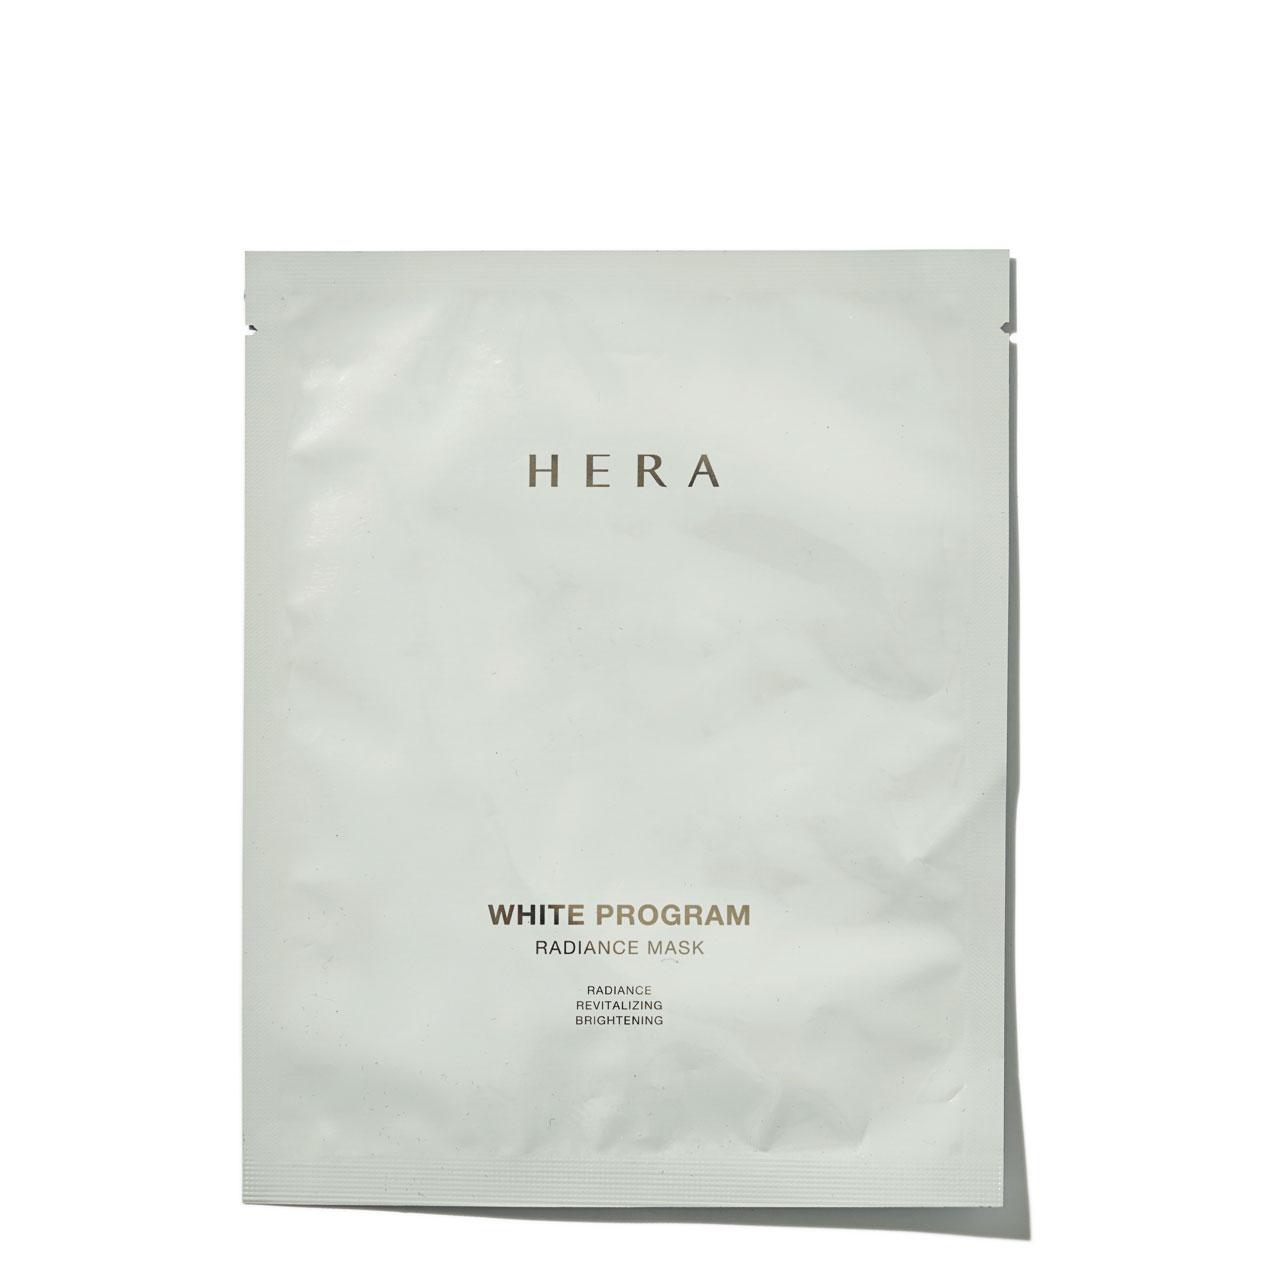 <strong>Hera 화이트 프로그램 래디언스 마스크</strong> 6매, 5만5천원대